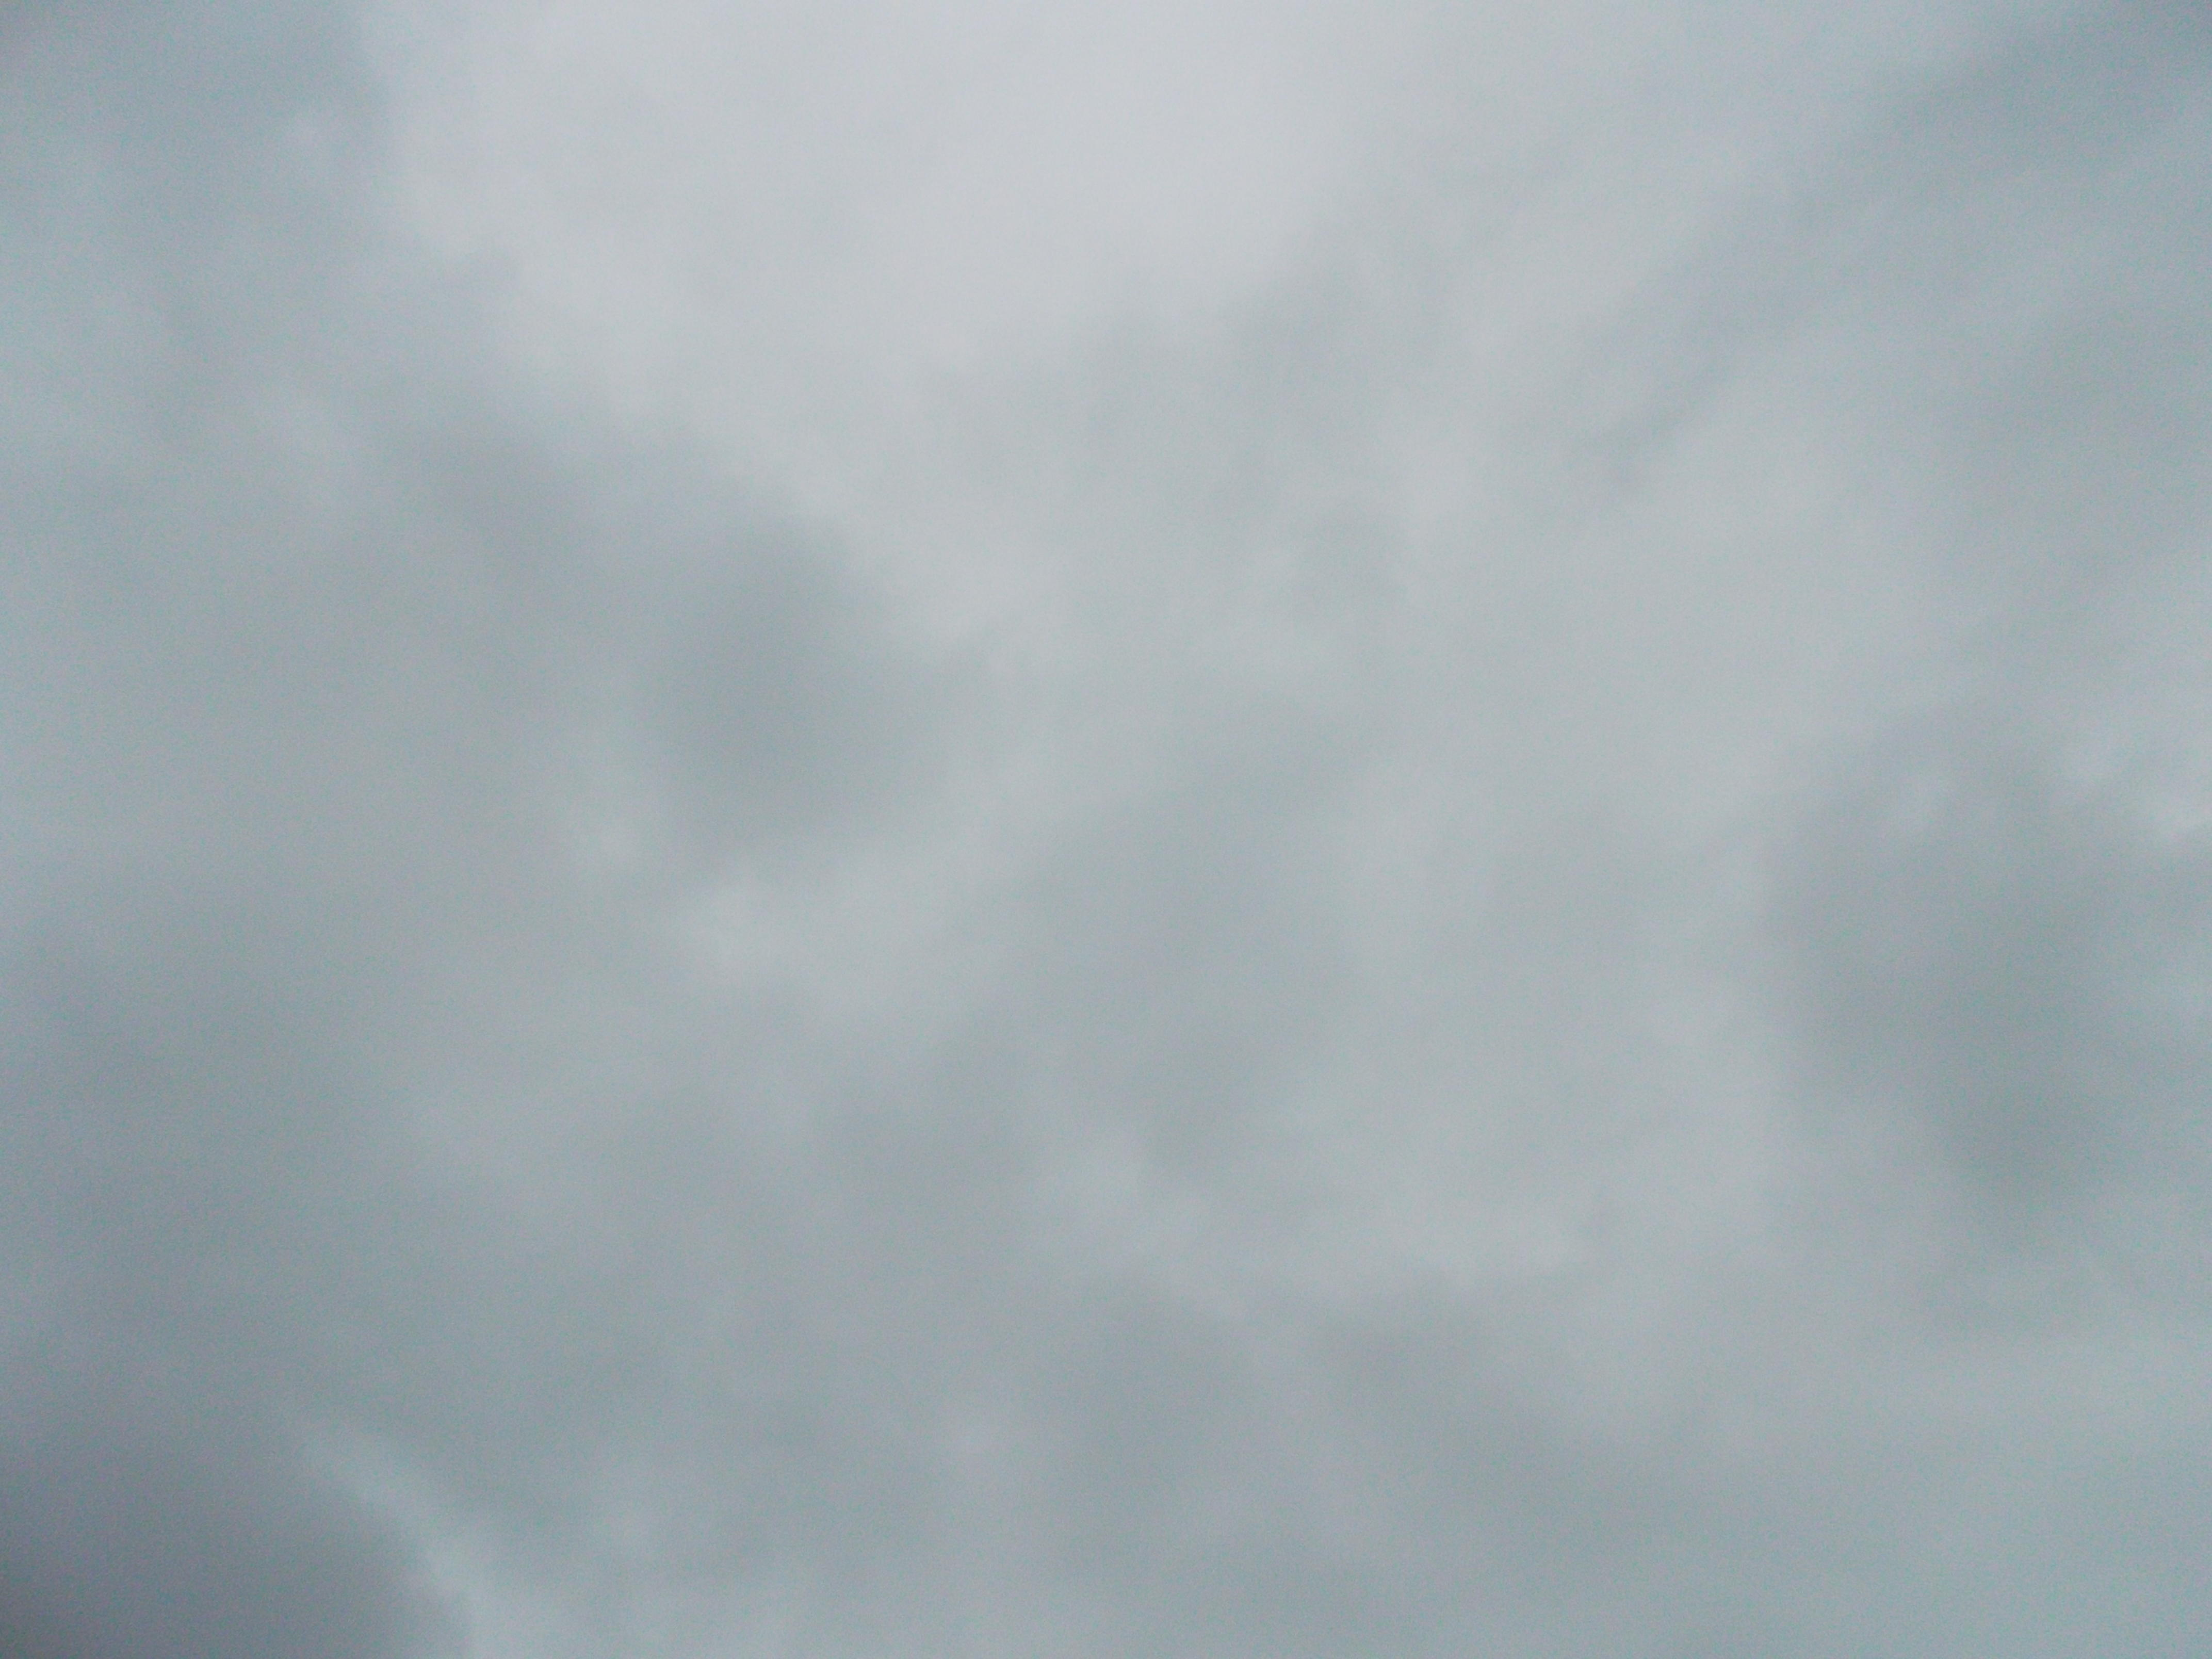 2013-05-19 Longitude -0.371 Latitude 49.182 Altitude 29 Heure 10h28